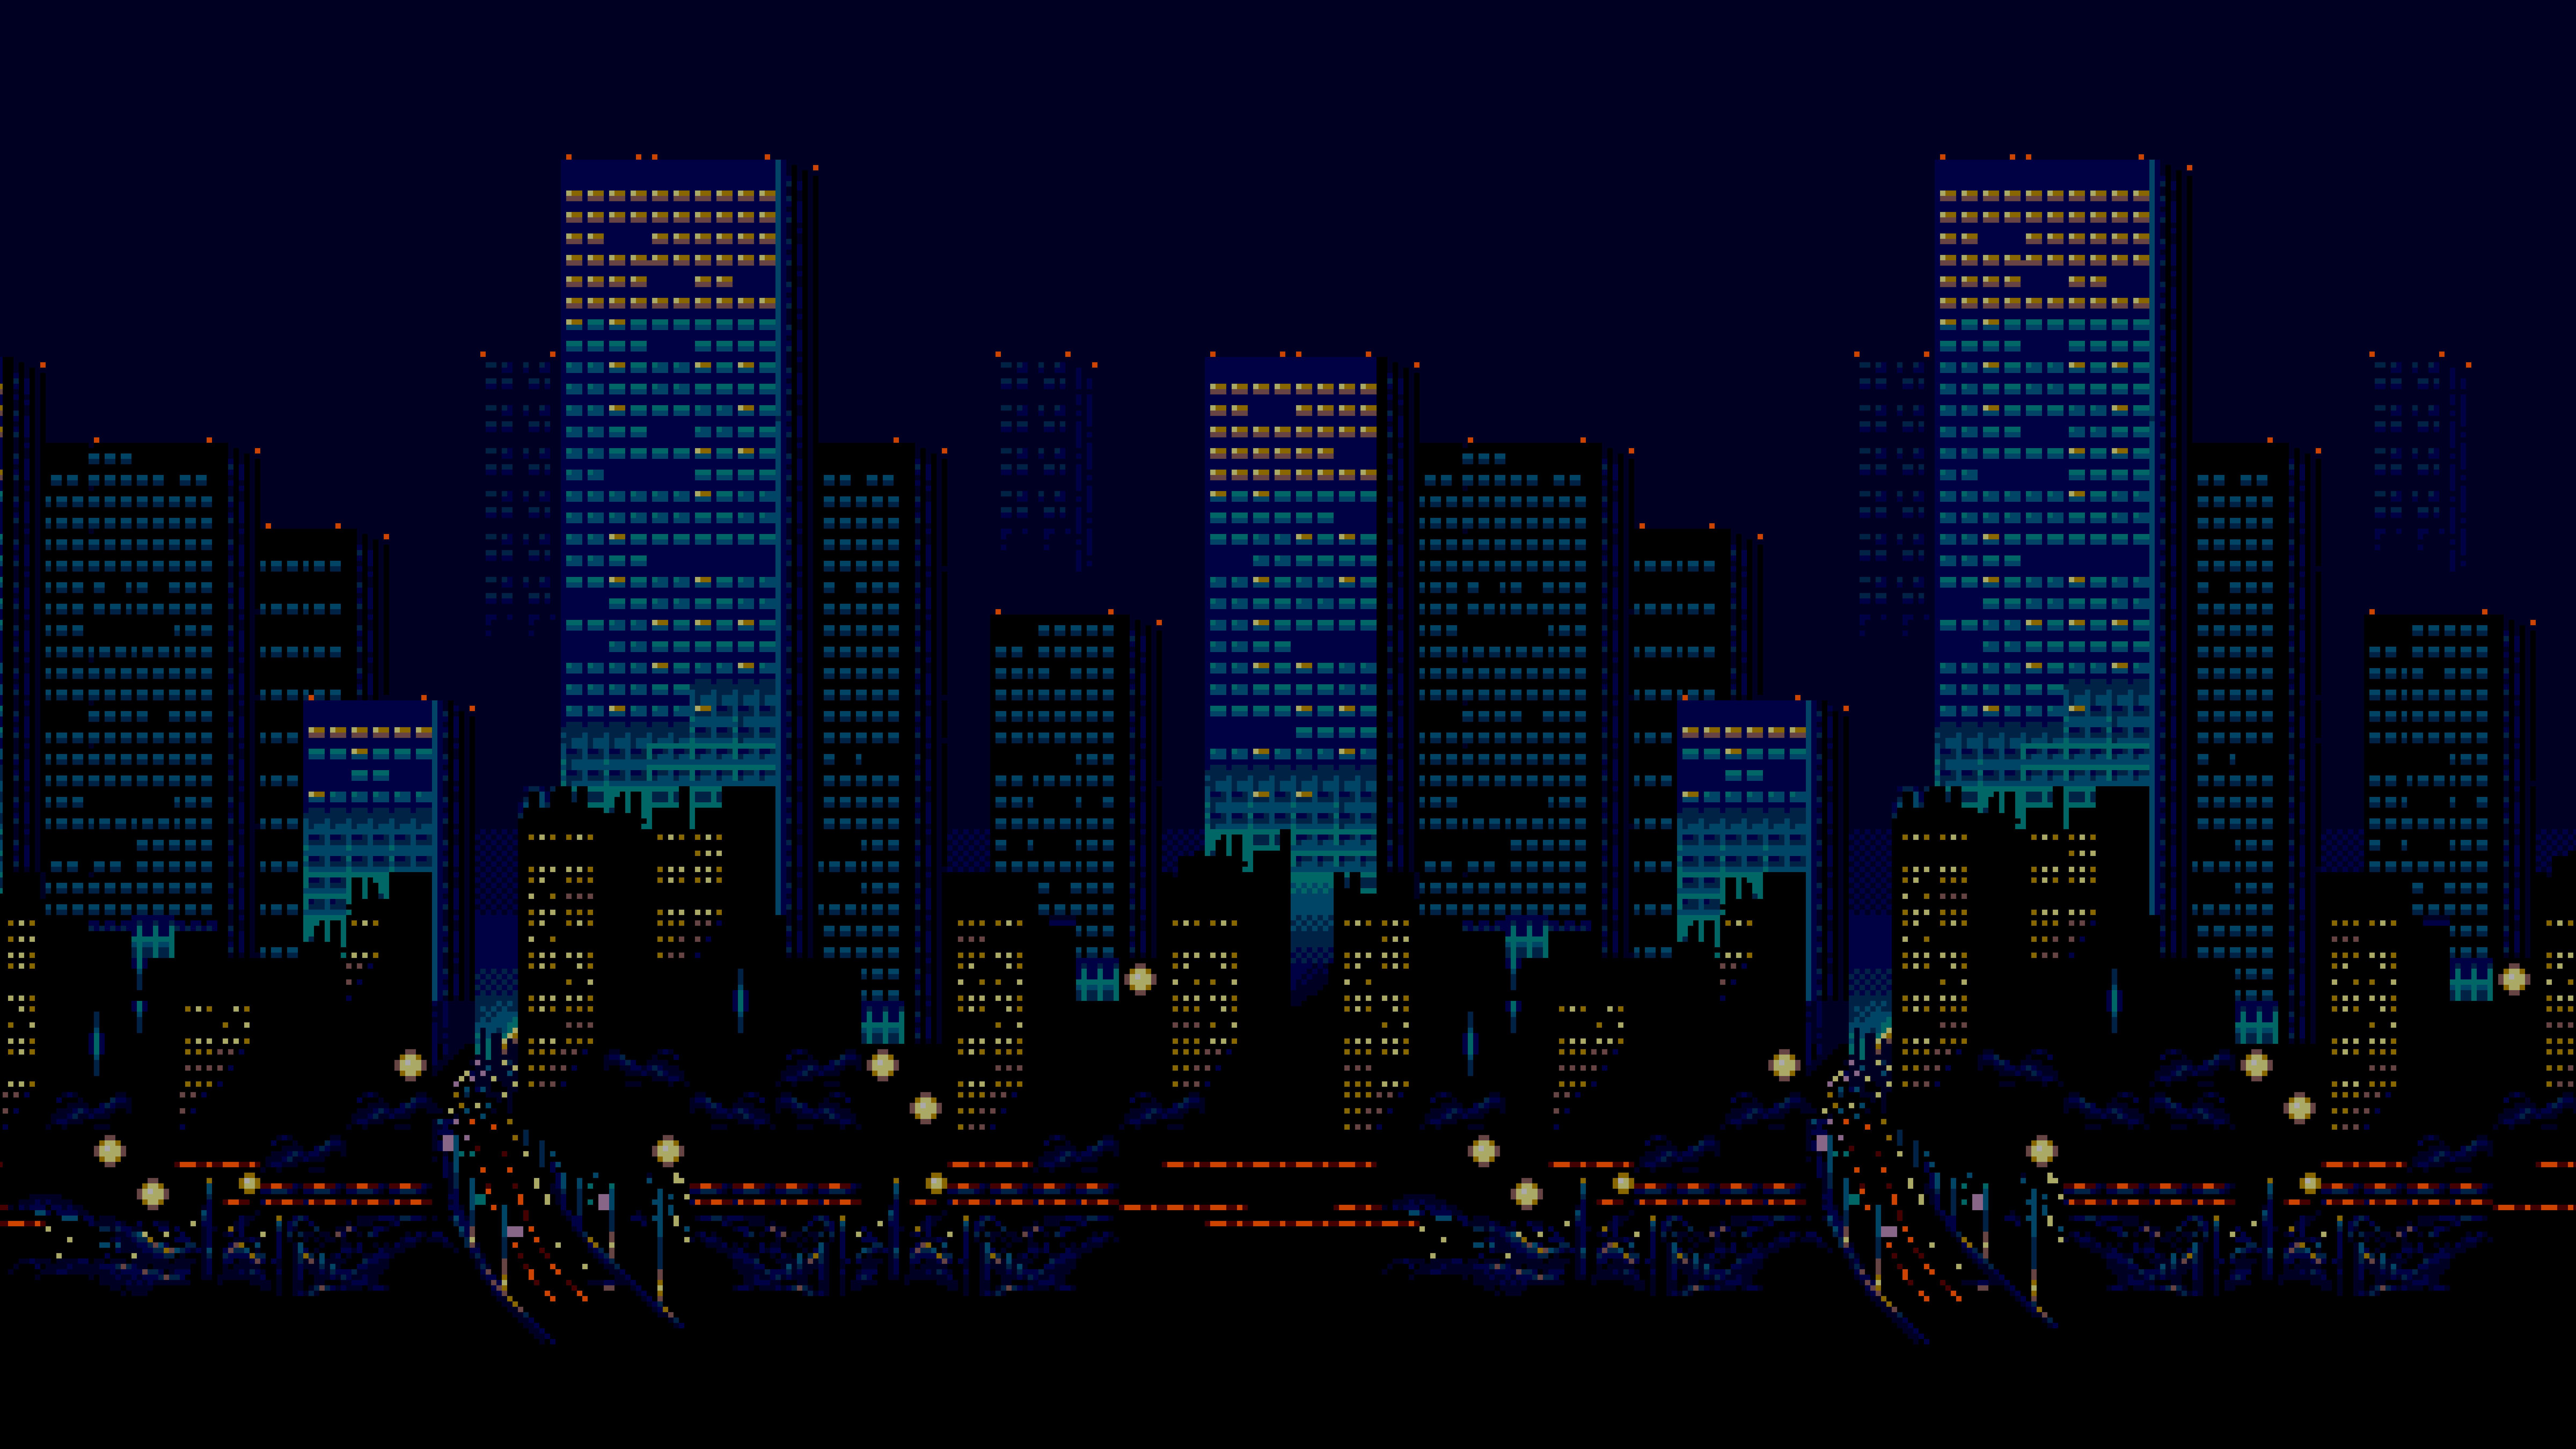 Https Img 4plebs Org Boards Hr Image 1493 83 1493831955370 Png City Skyline Night Pixel Art City Skyline